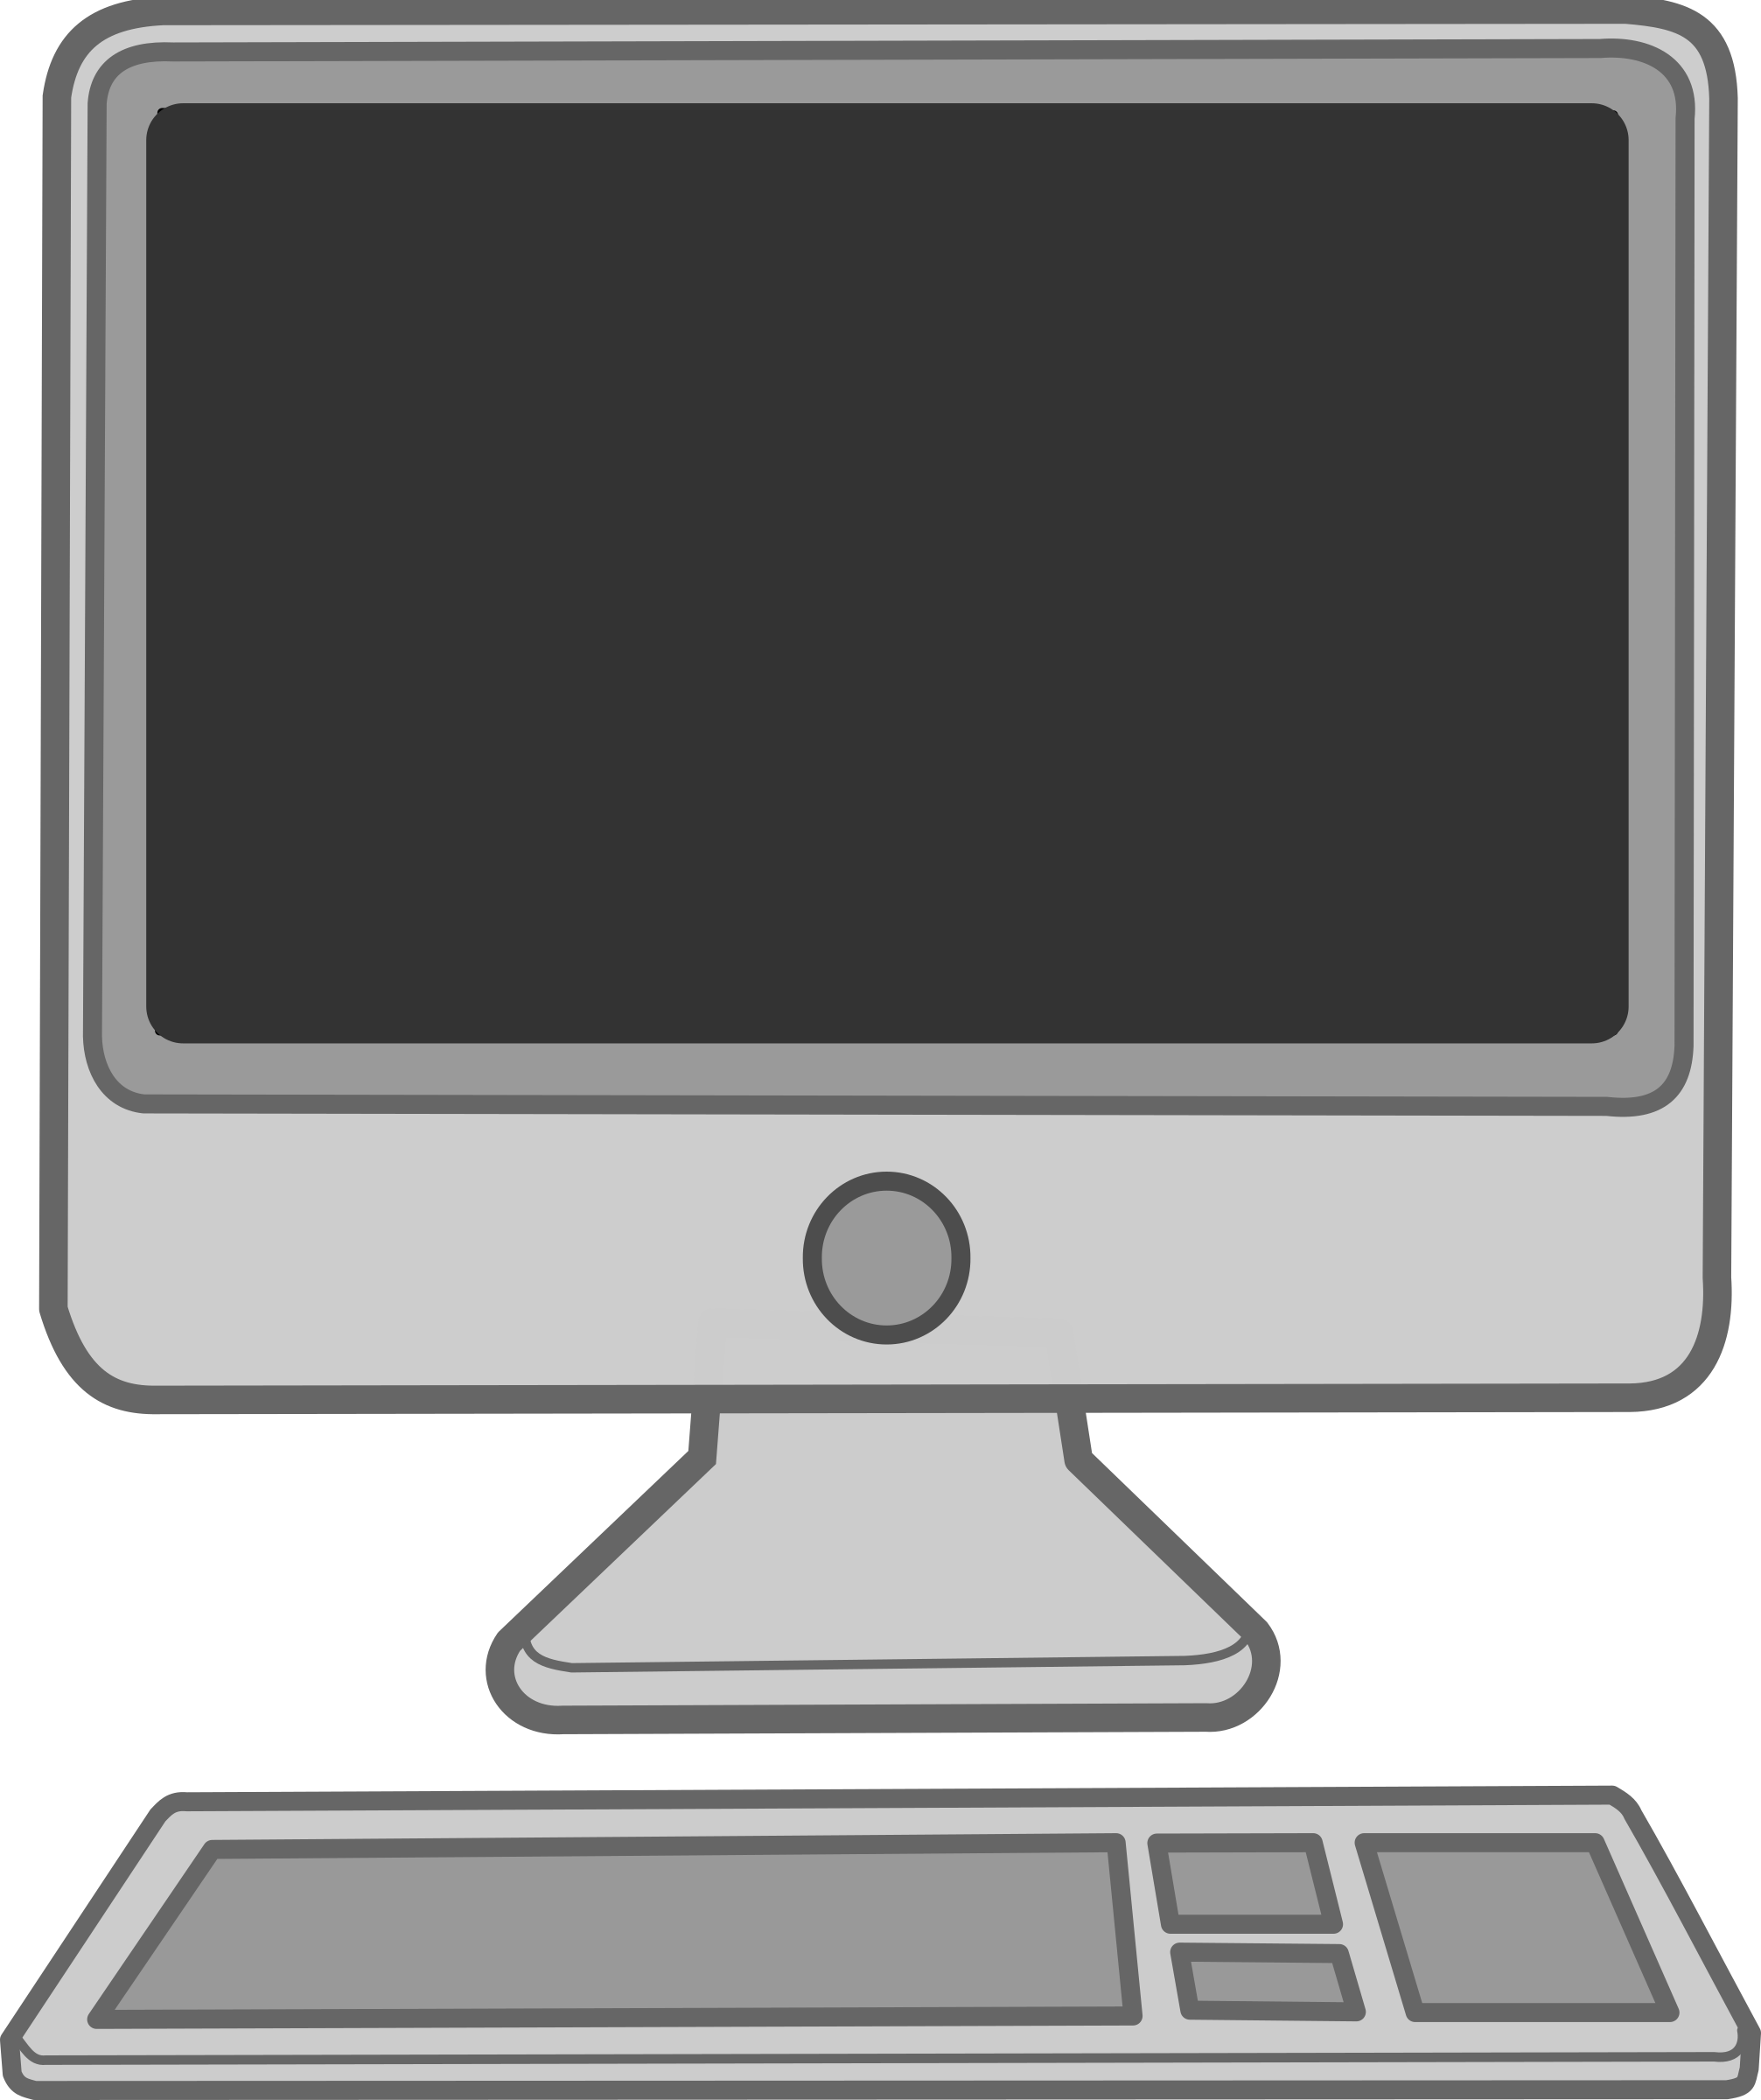 Computer Clipart #216-Computer Clipart #216-18